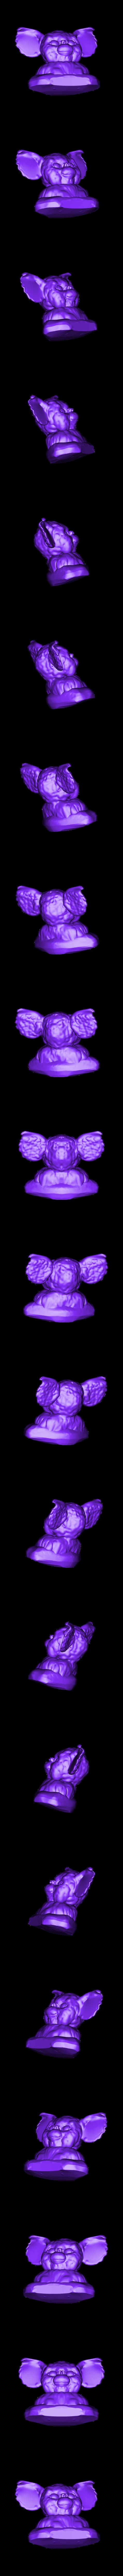 gizmo.obj Download OBJ file Gizmo (known bust series) • Design to 3D print, Majin59